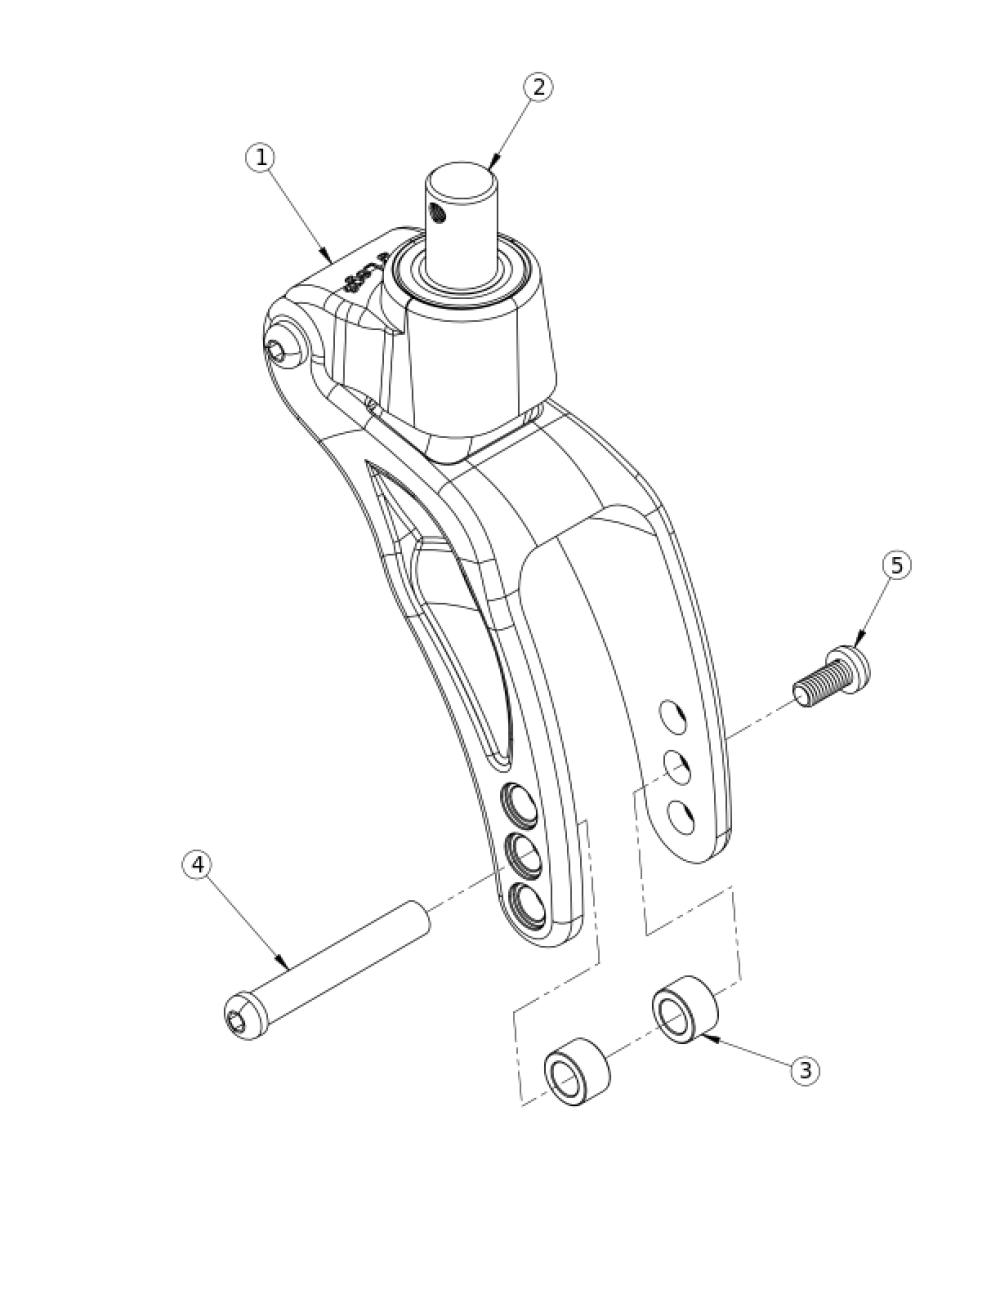 Rogue / Clik / Ethos Frog Legs Ii Suspension System (phase 2 Carbon Fork) parts diagram